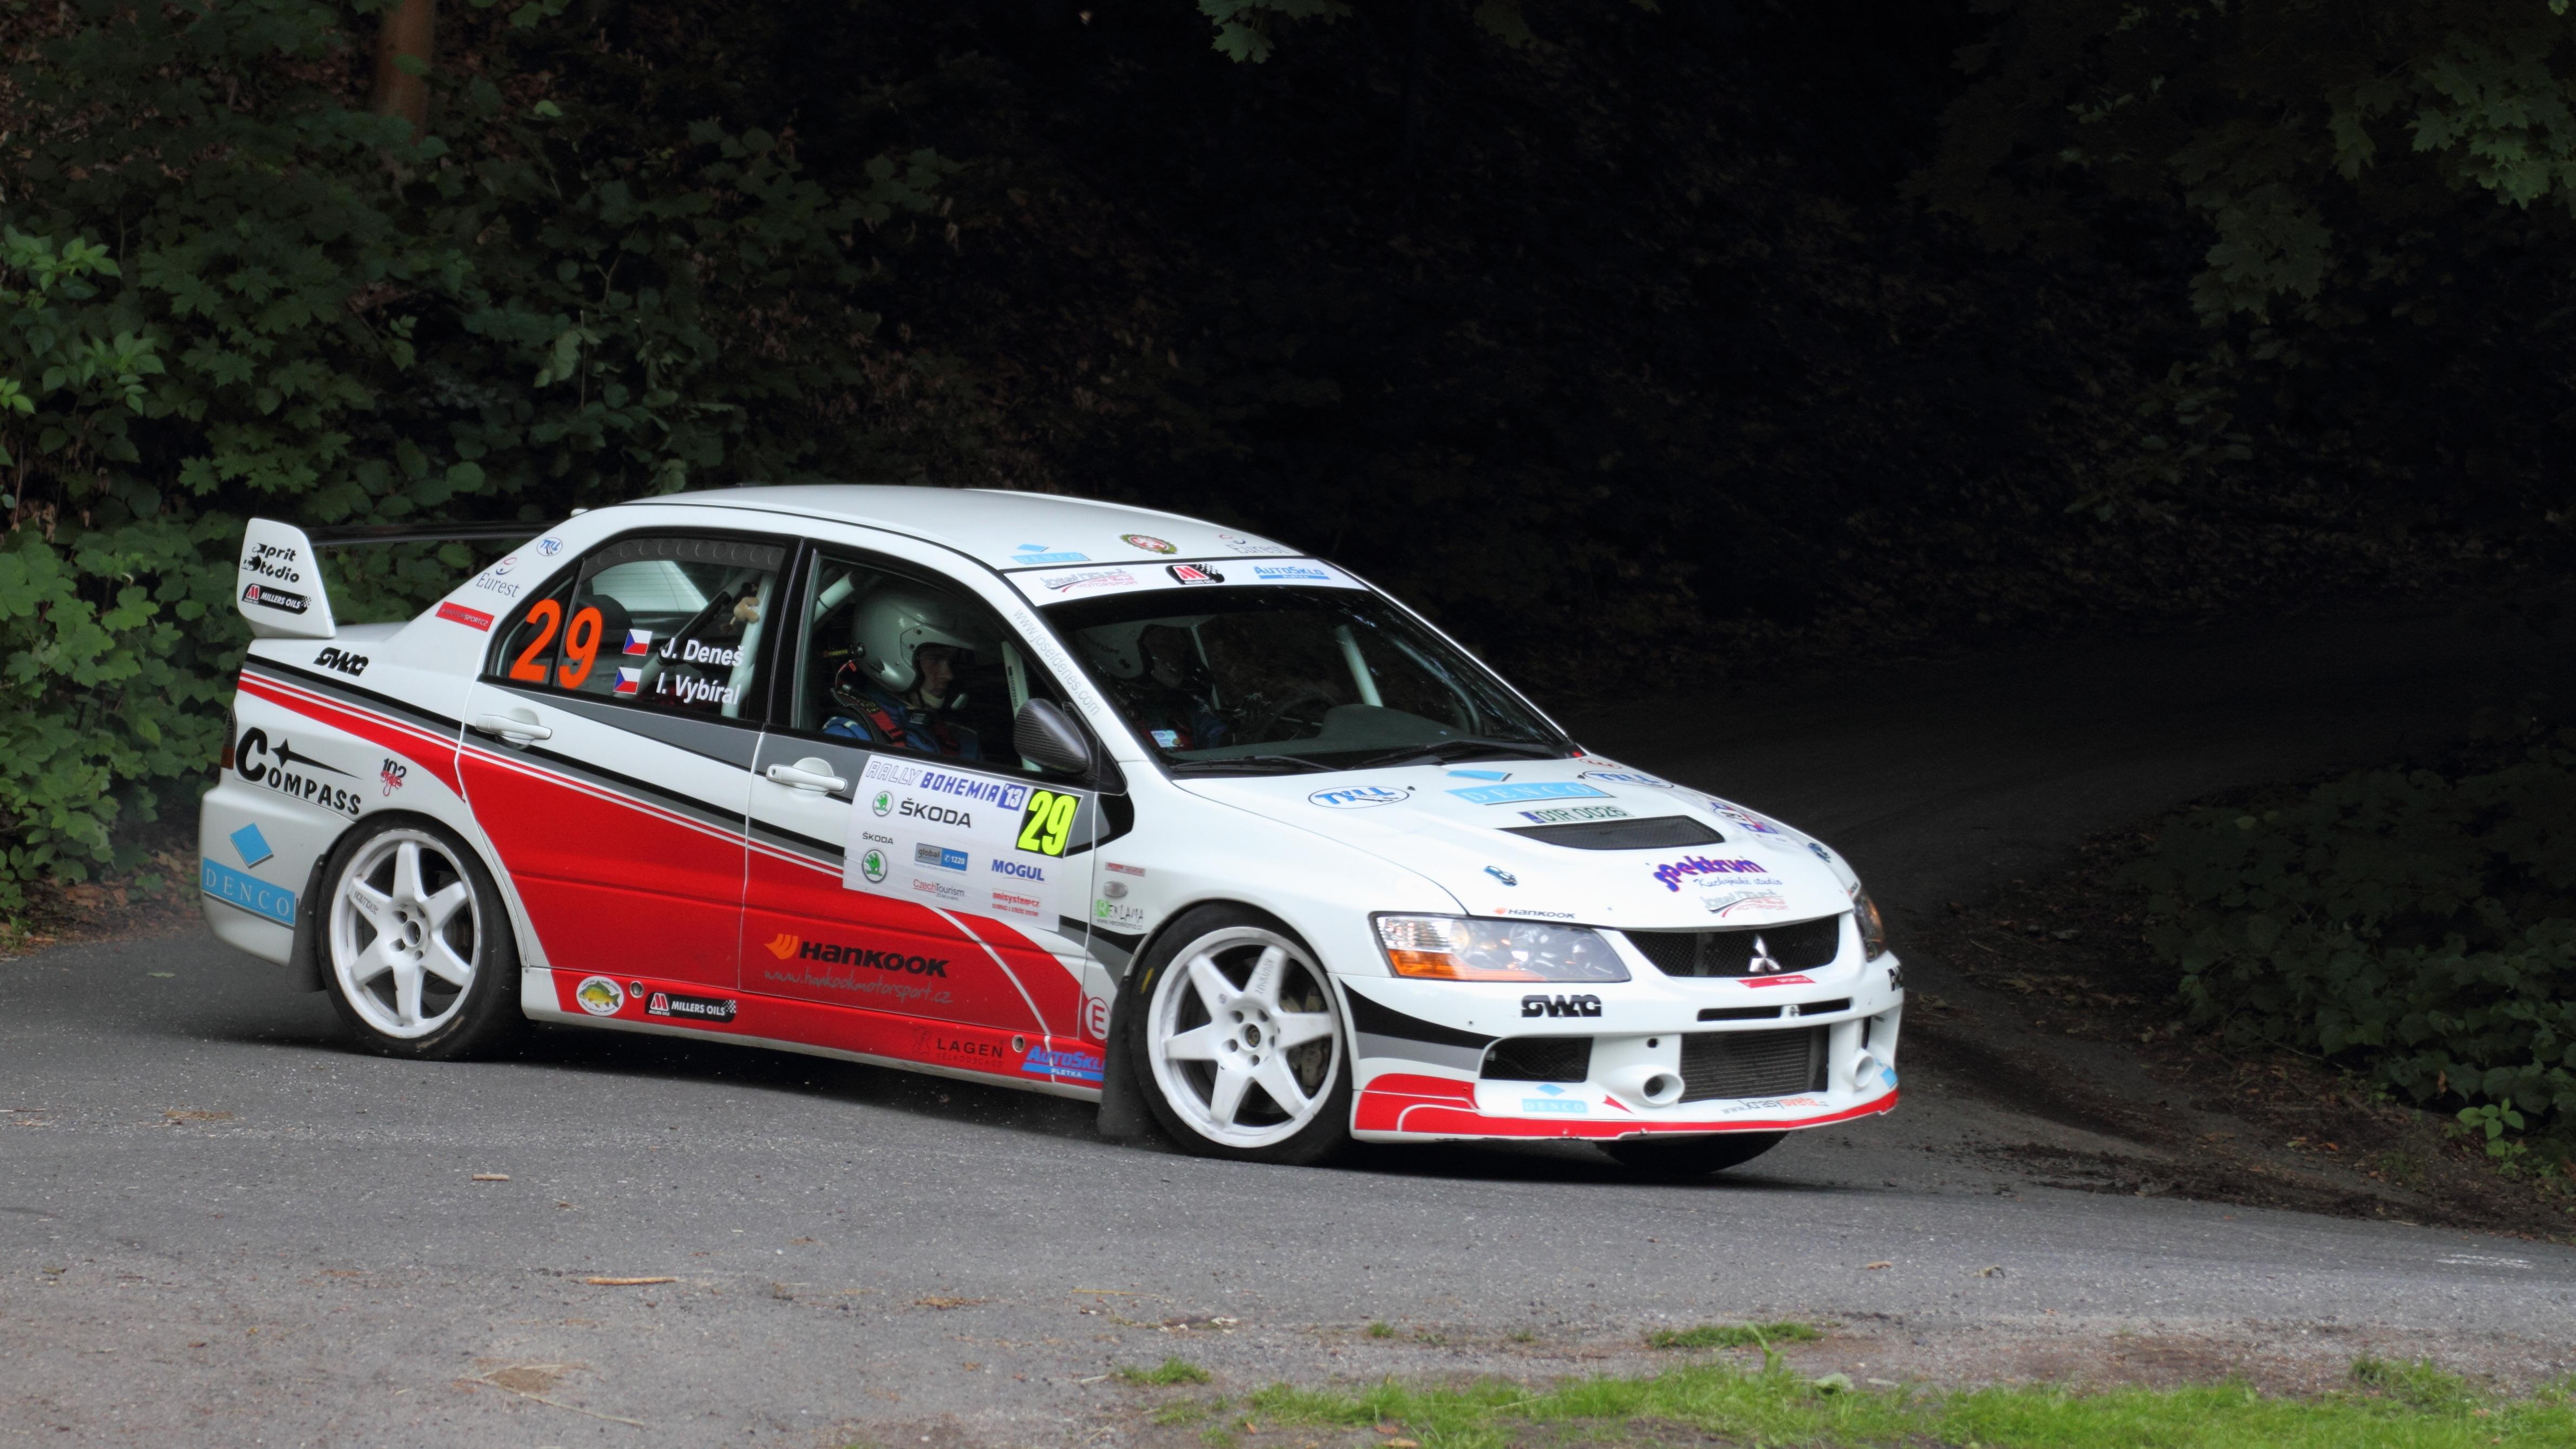 File:Rally Bohemia 2013 - Deneš, Mitsubishi Lancer Evo IX.JPG - Wikimedia Commons